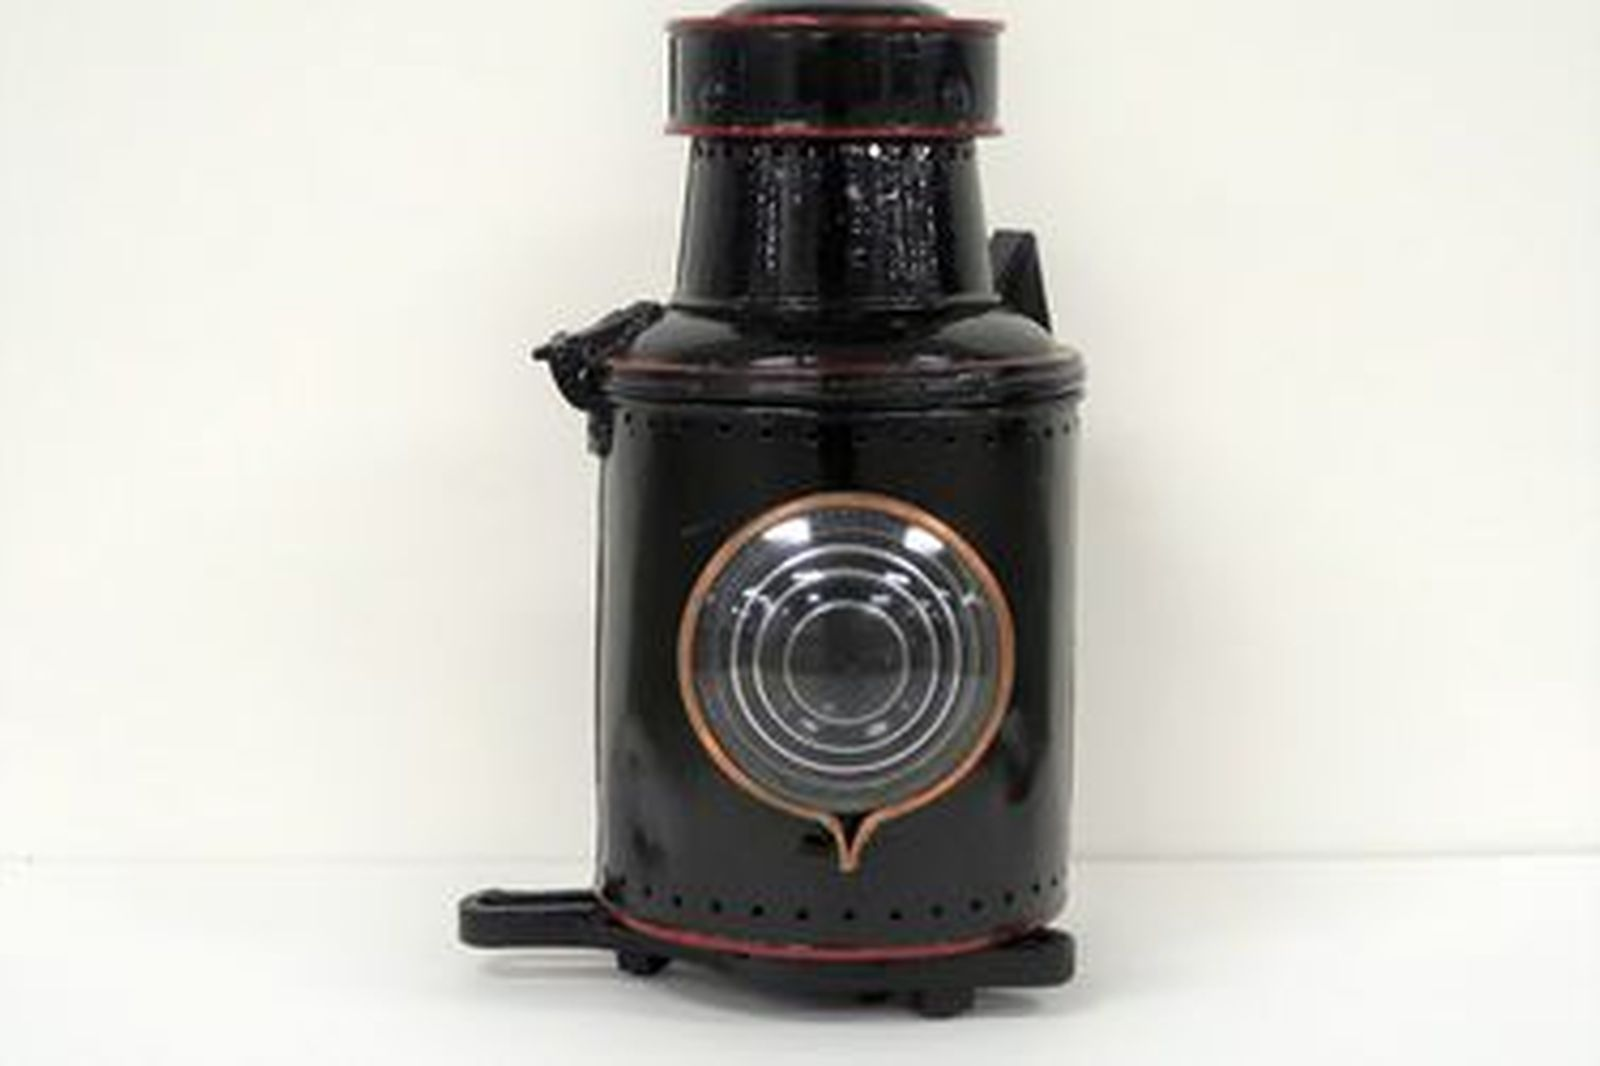 Lamp - Vintage Cosmetically Restored Railway Lamp